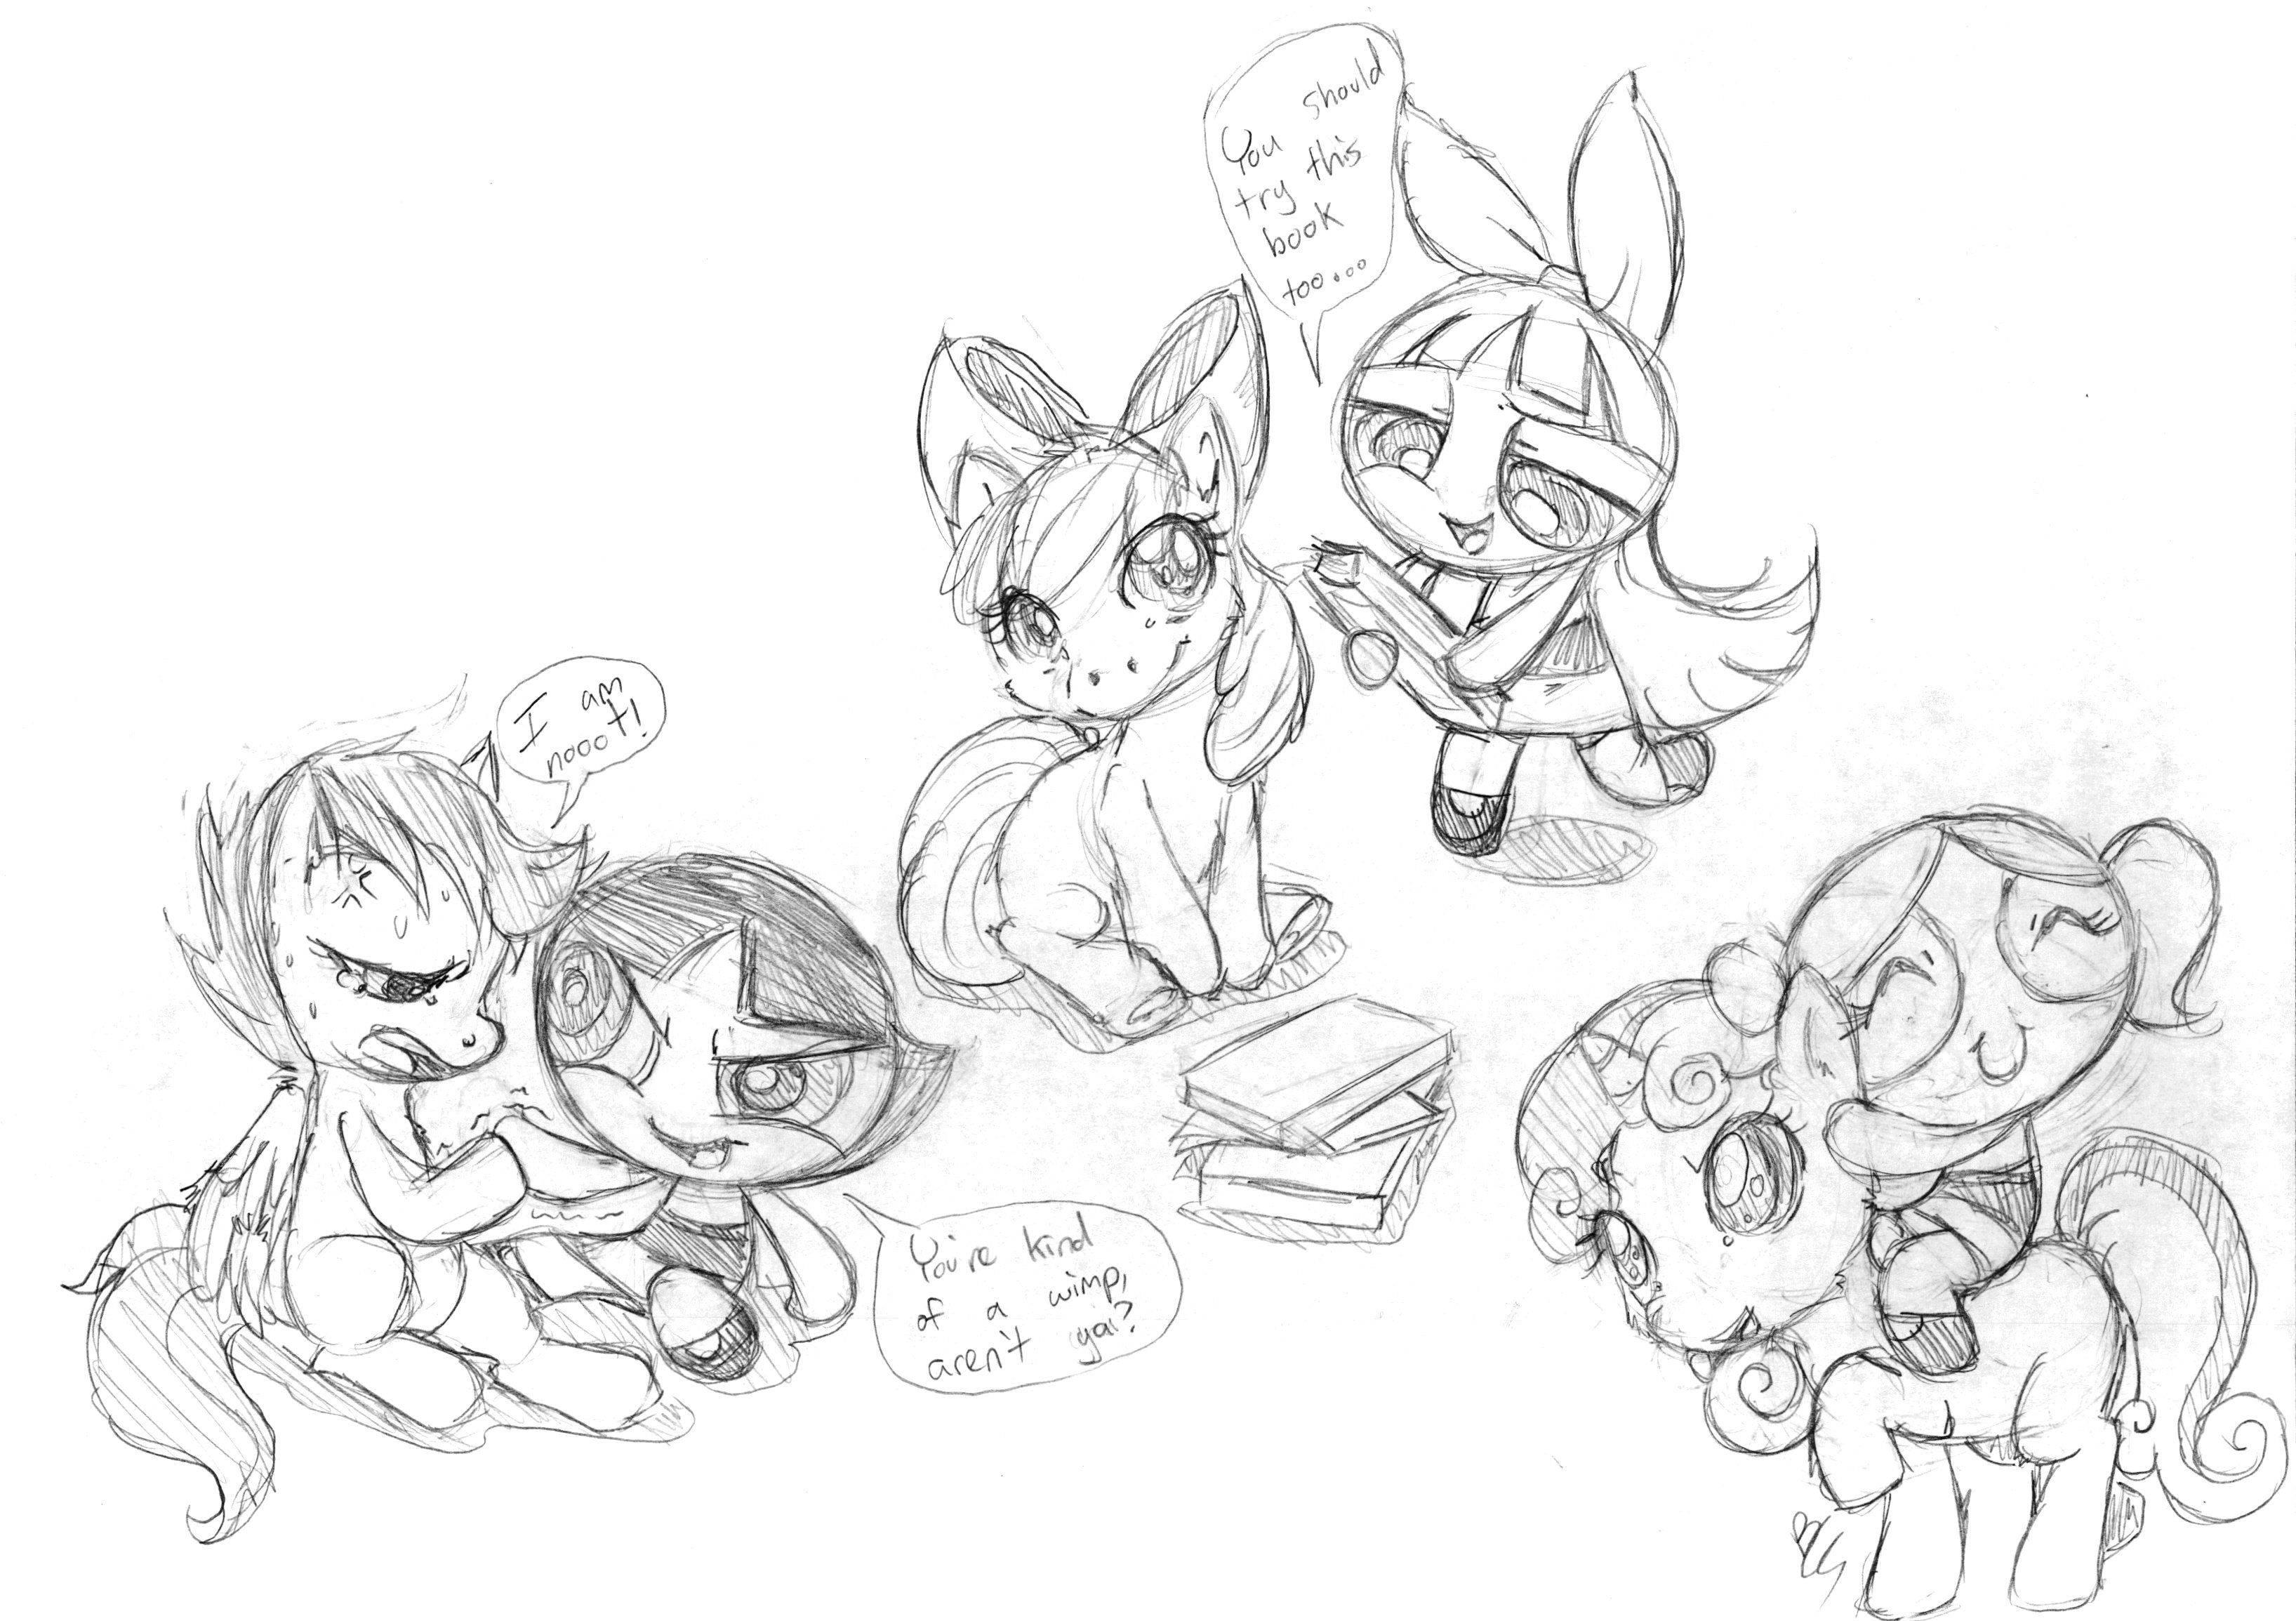 apple bloom, blossom, bubbles, buttercup, cutie mark